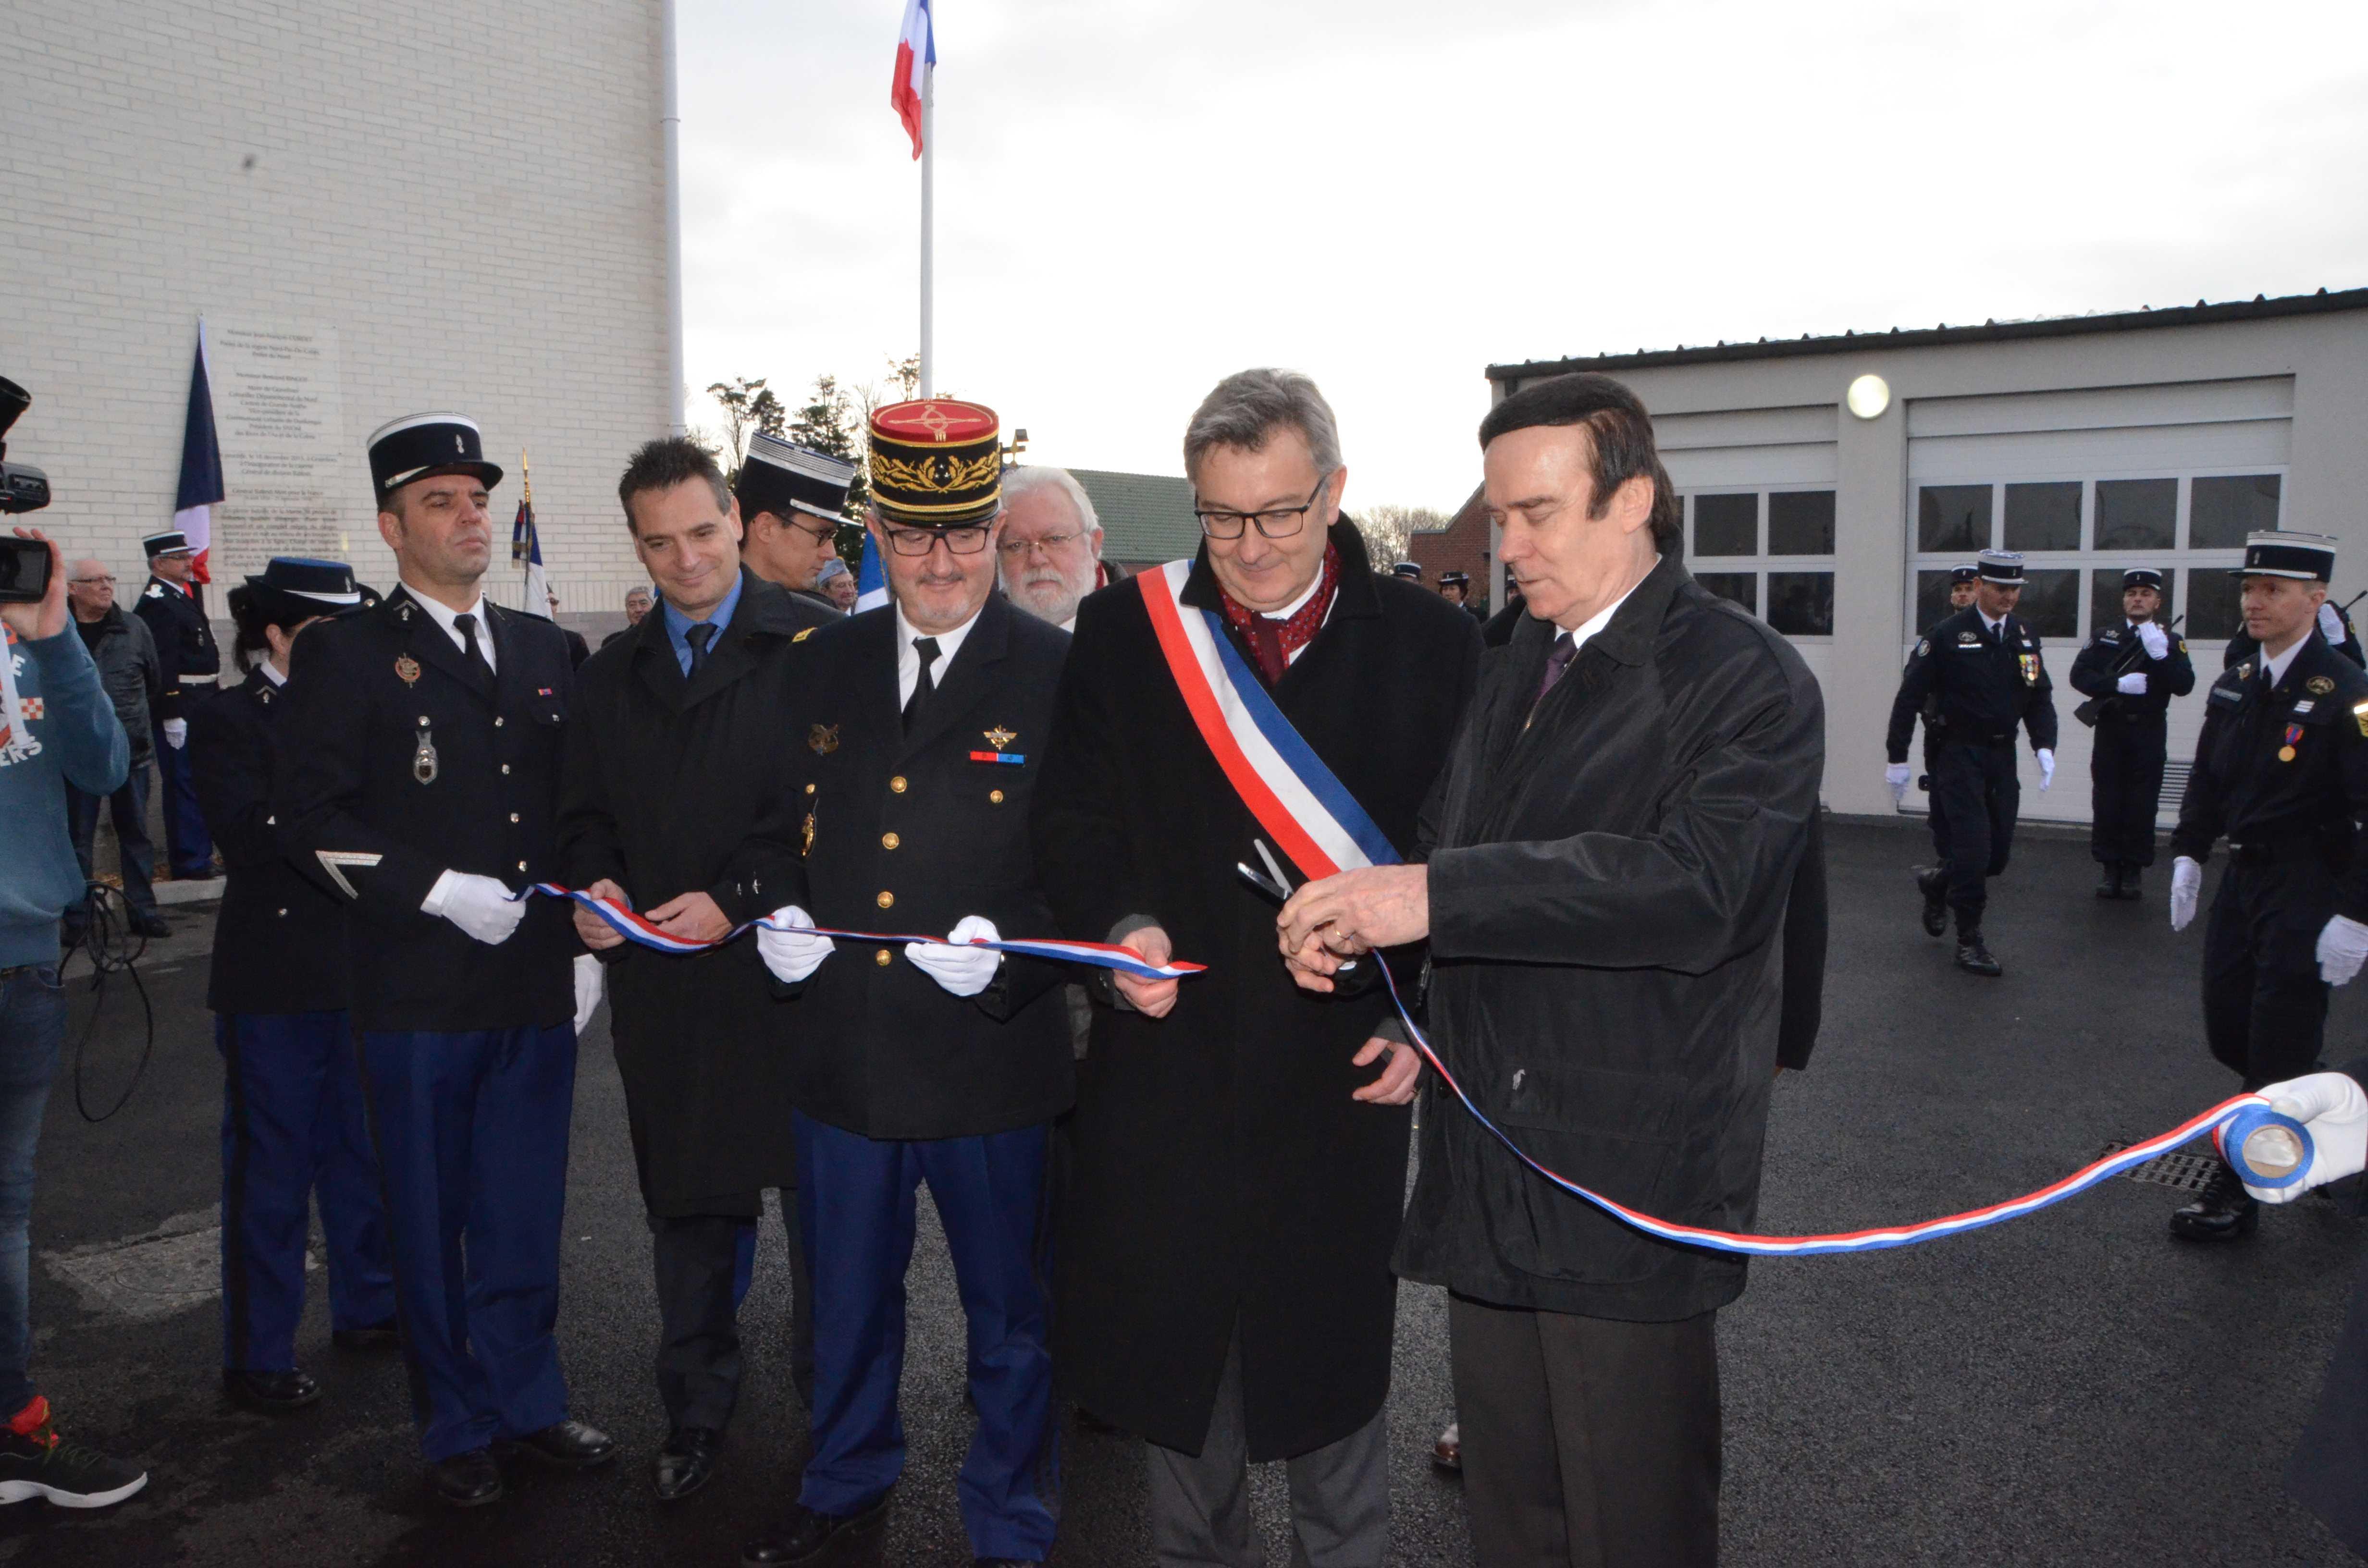 Gendarmerie nationale inauguration de la caserne de for Gendarmerie interieur gouv fr gign